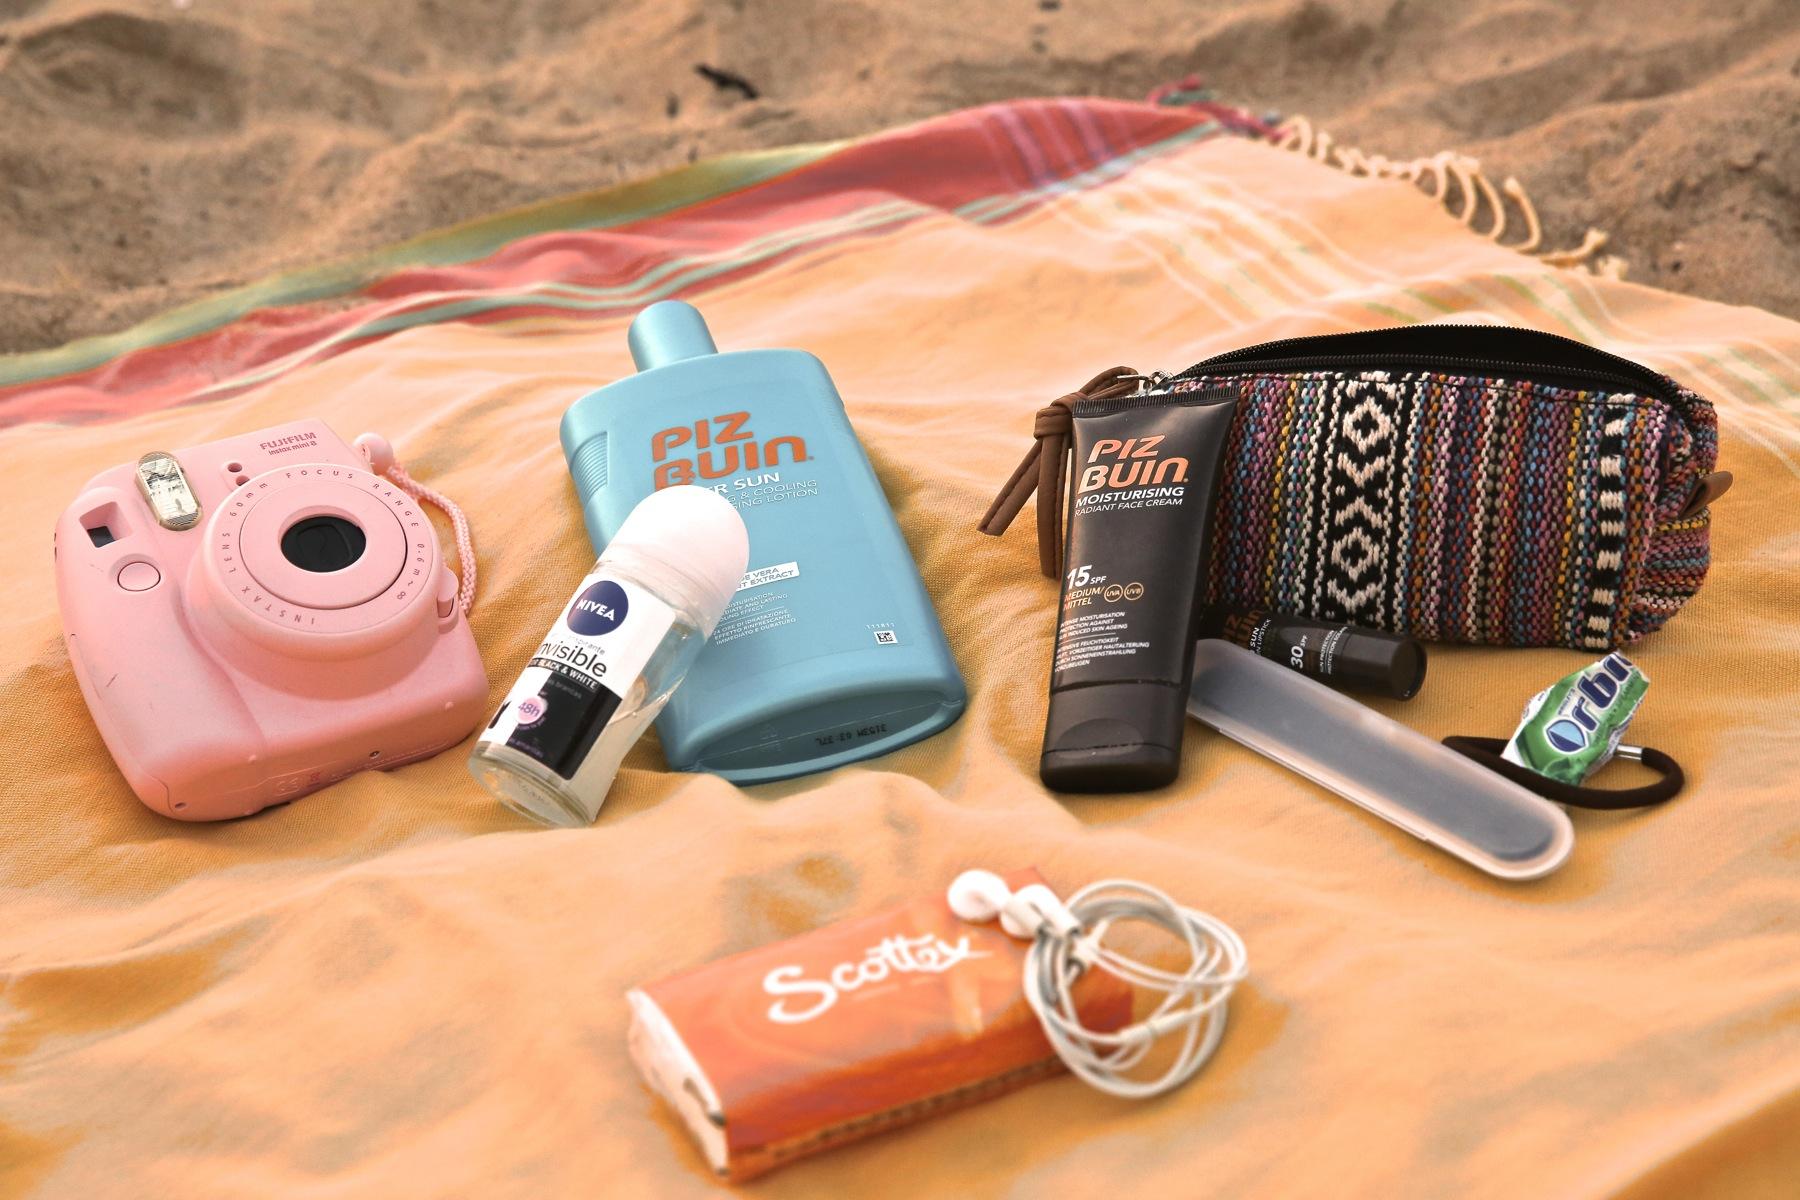 trendy_taste-look-outfit-street_style-boho-ootd-blog-blogger-fashion_spain-moda_españa-verano-crochet-vestido-bikini-hippie-dress-galicia-sunset-puesta_de_sol-piz_buin-5